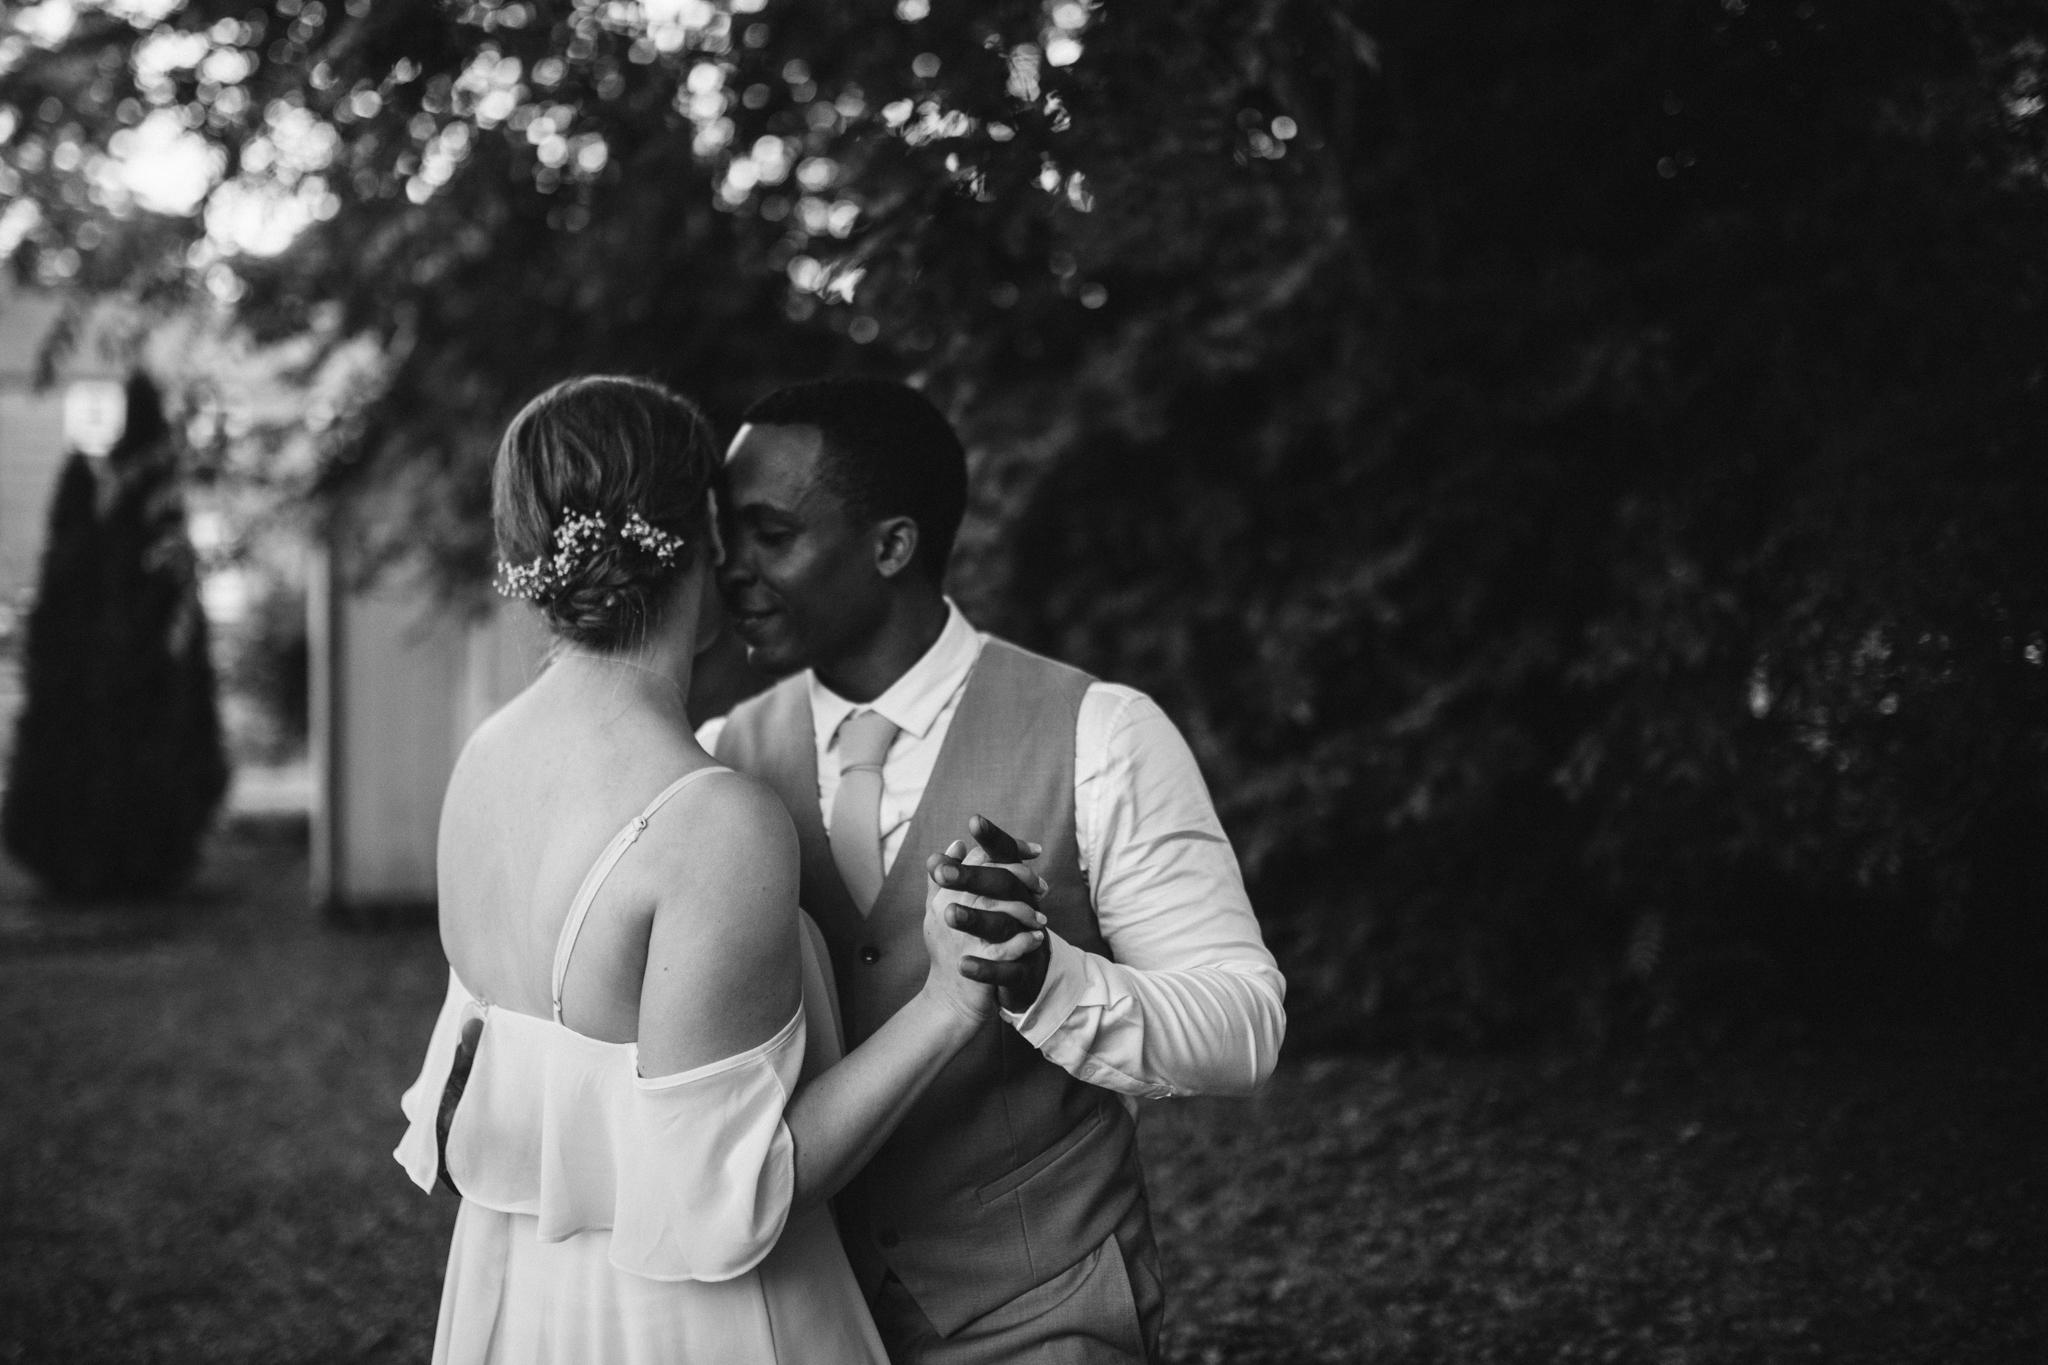 dorota_dwight_richmond_backyard_wedding-96.jpg